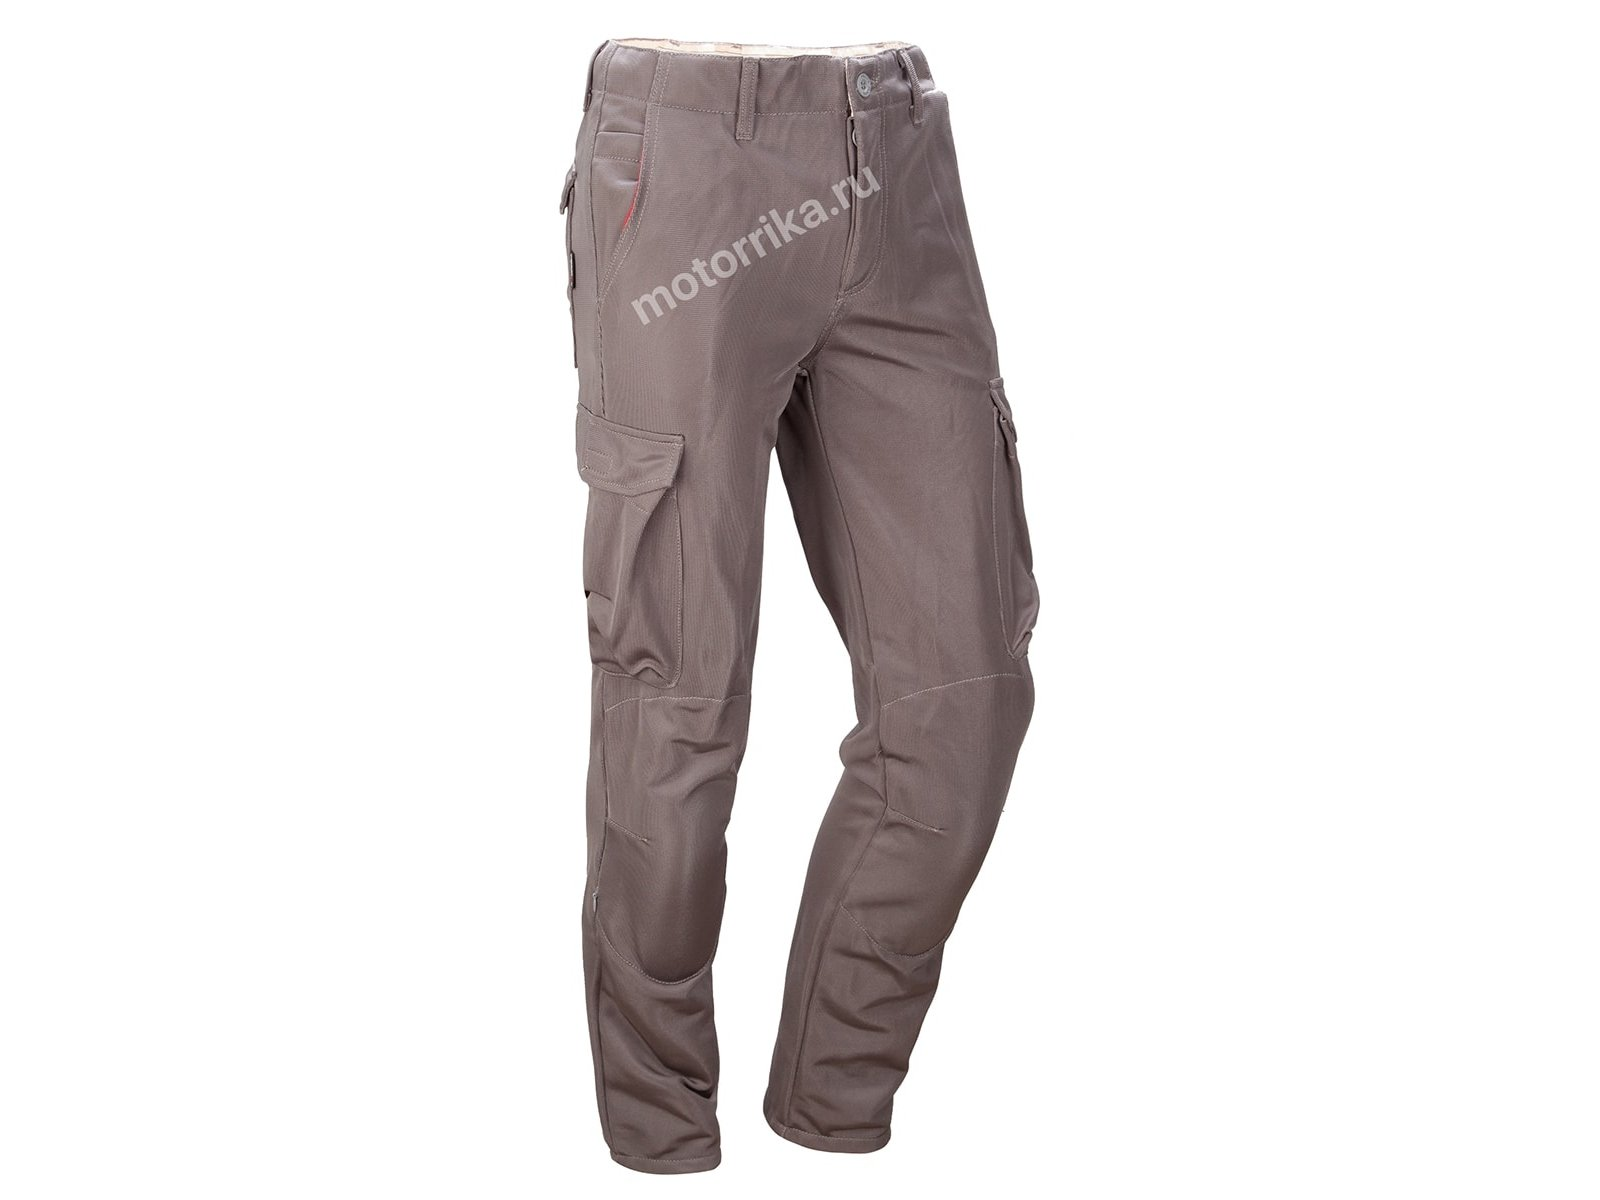 Мотобрюки Promo Jeans Panama Grey